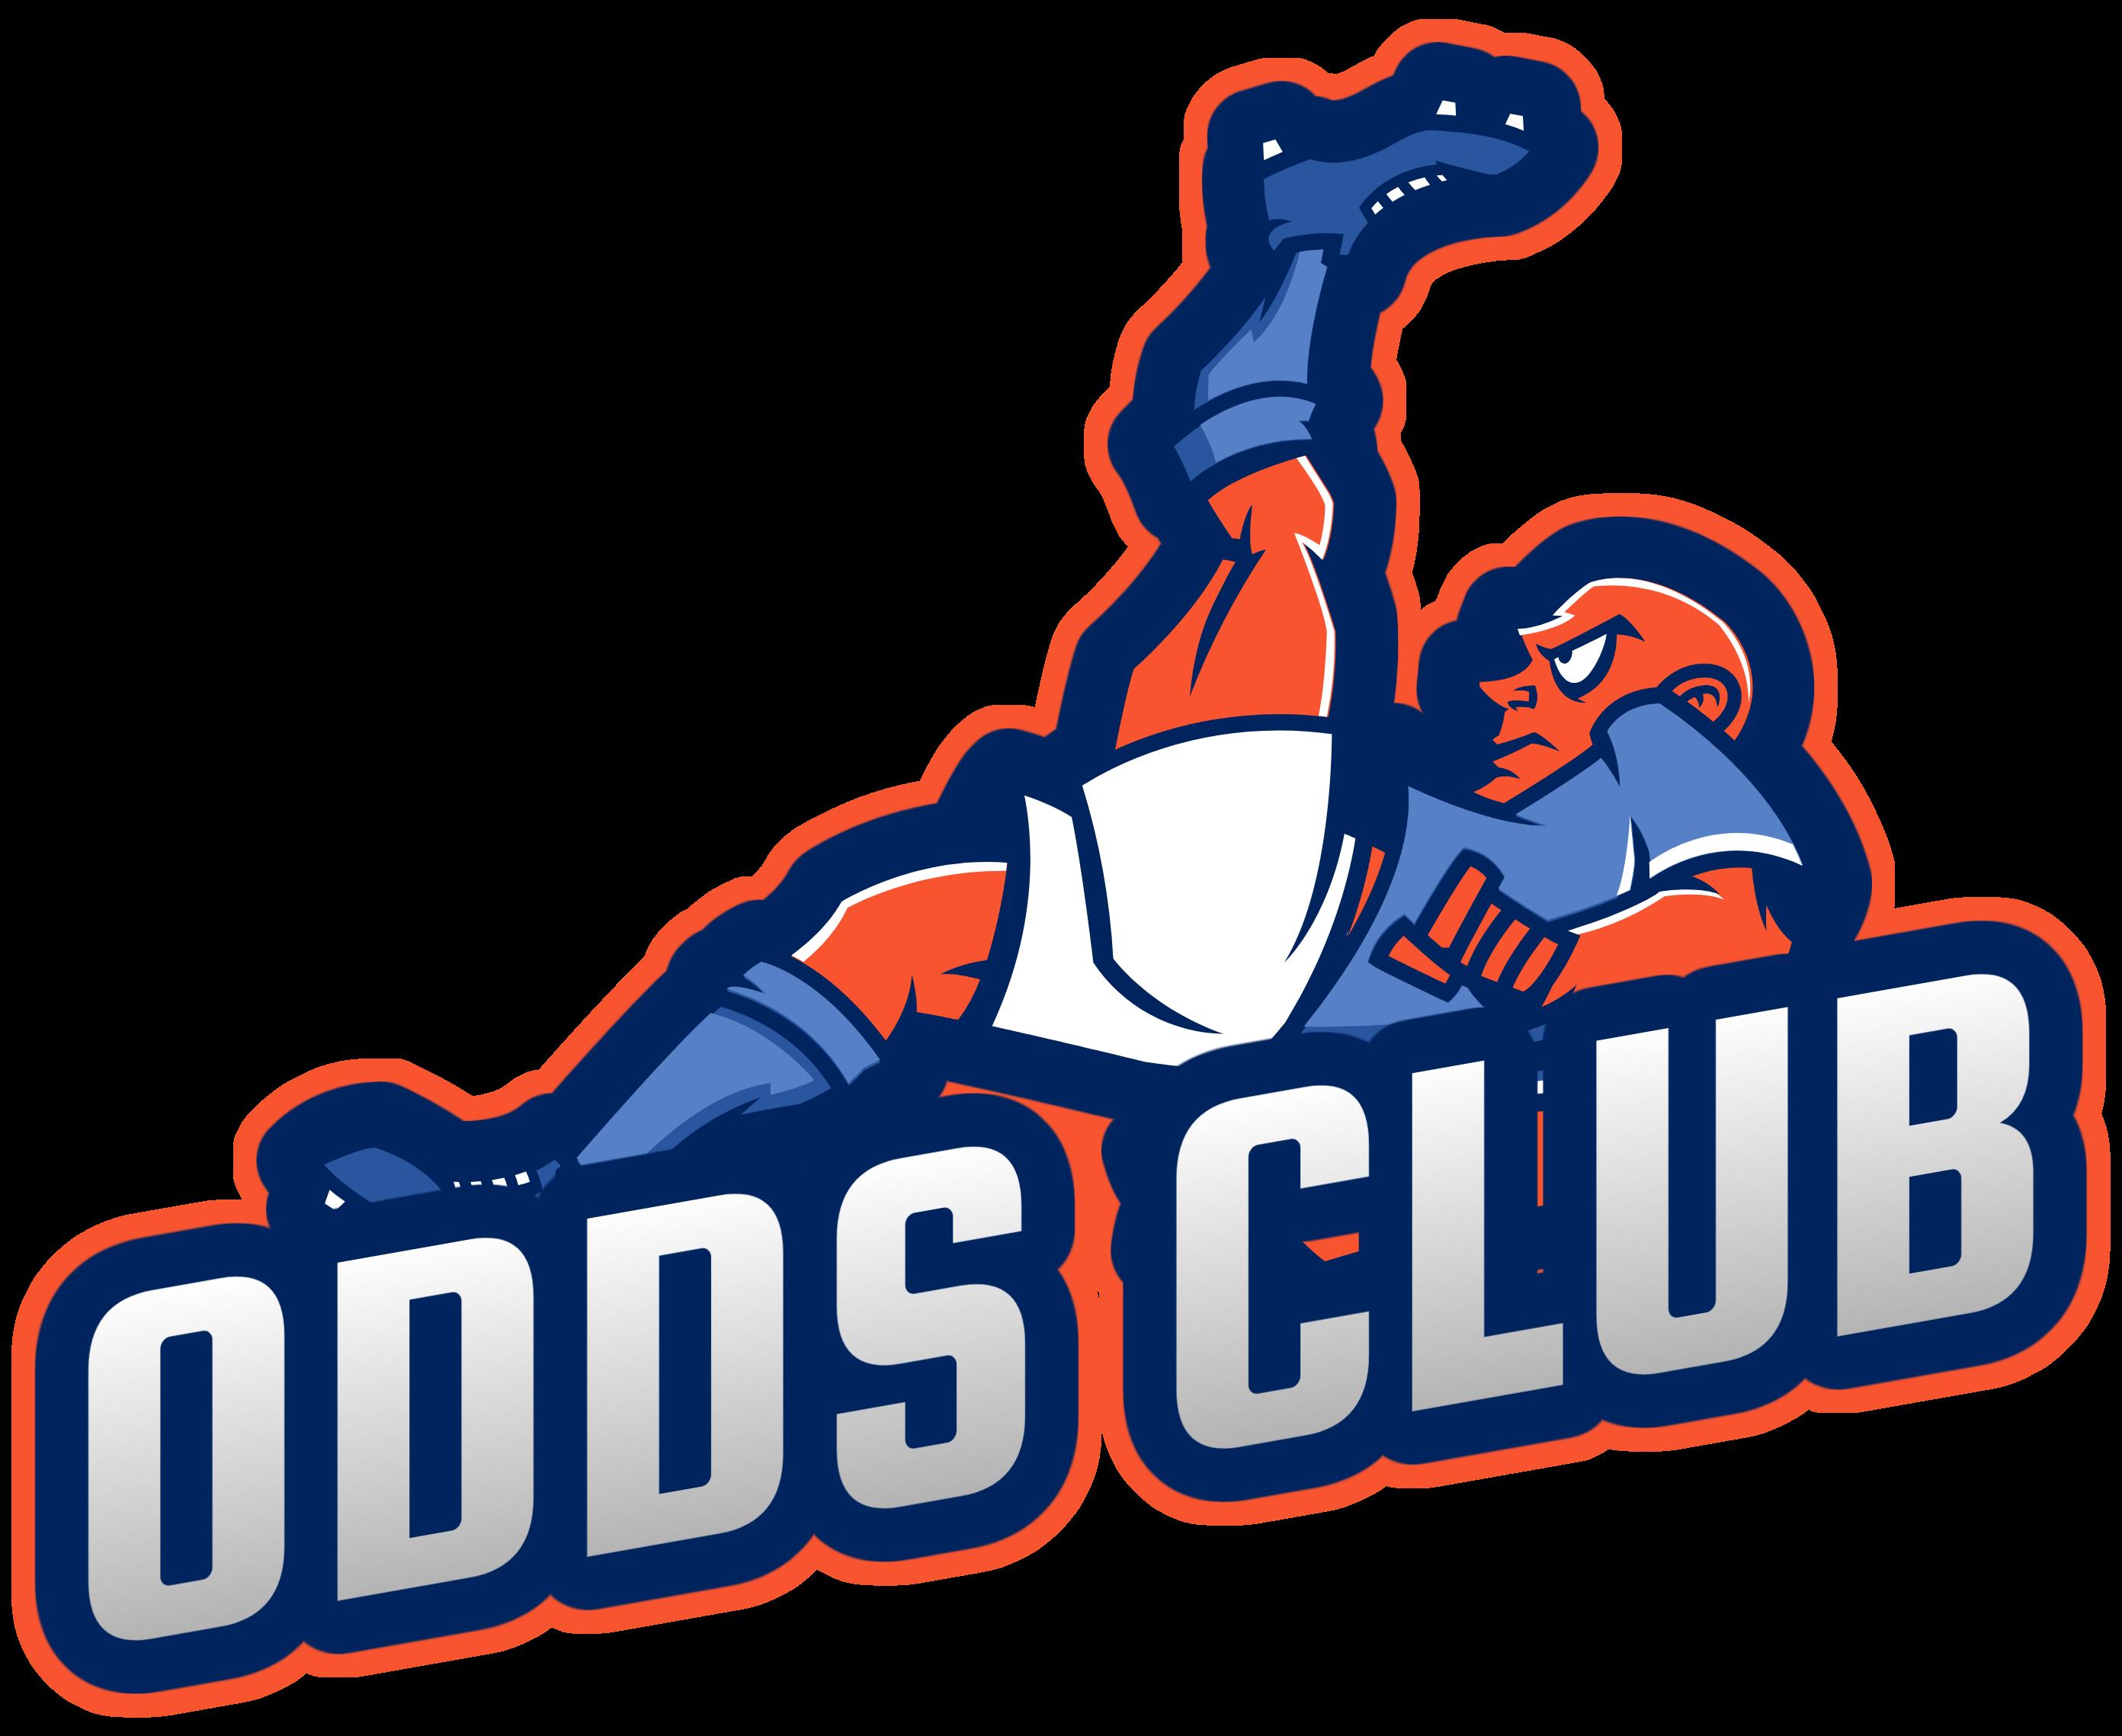 Tickets Odds Club